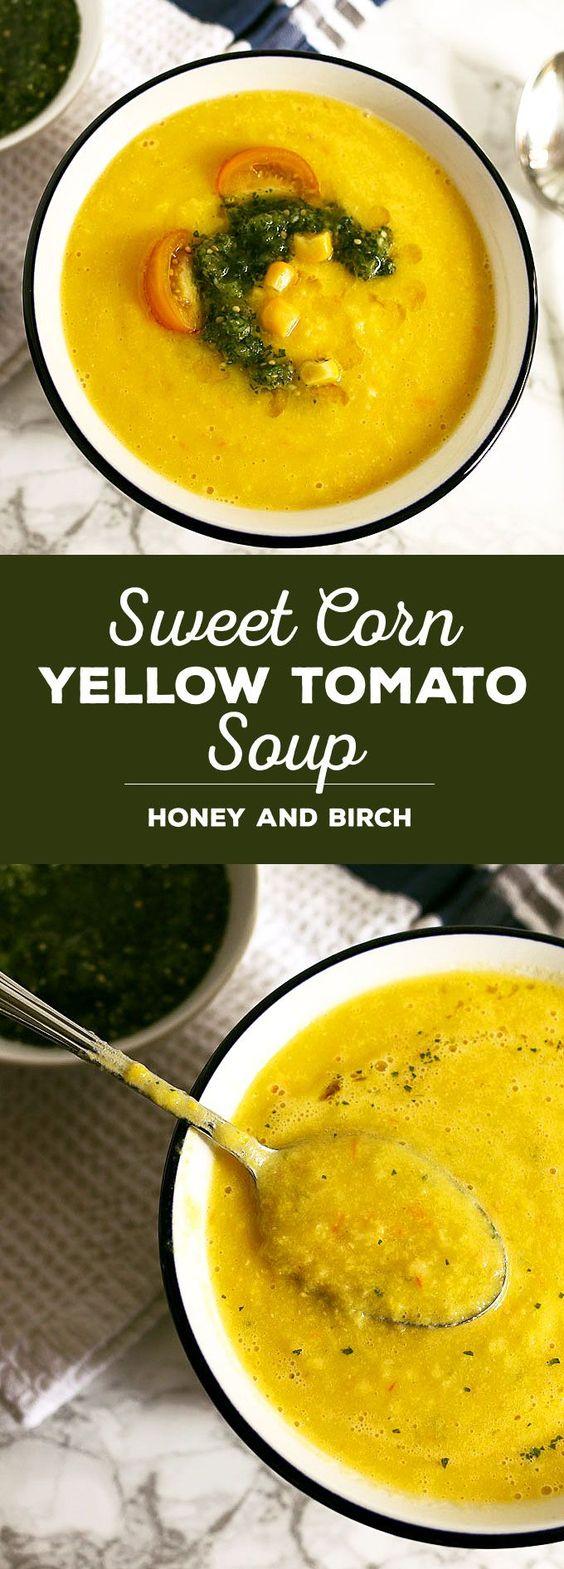 Sweet corn, Tomato soups and Cilantro sauce on Pinterest